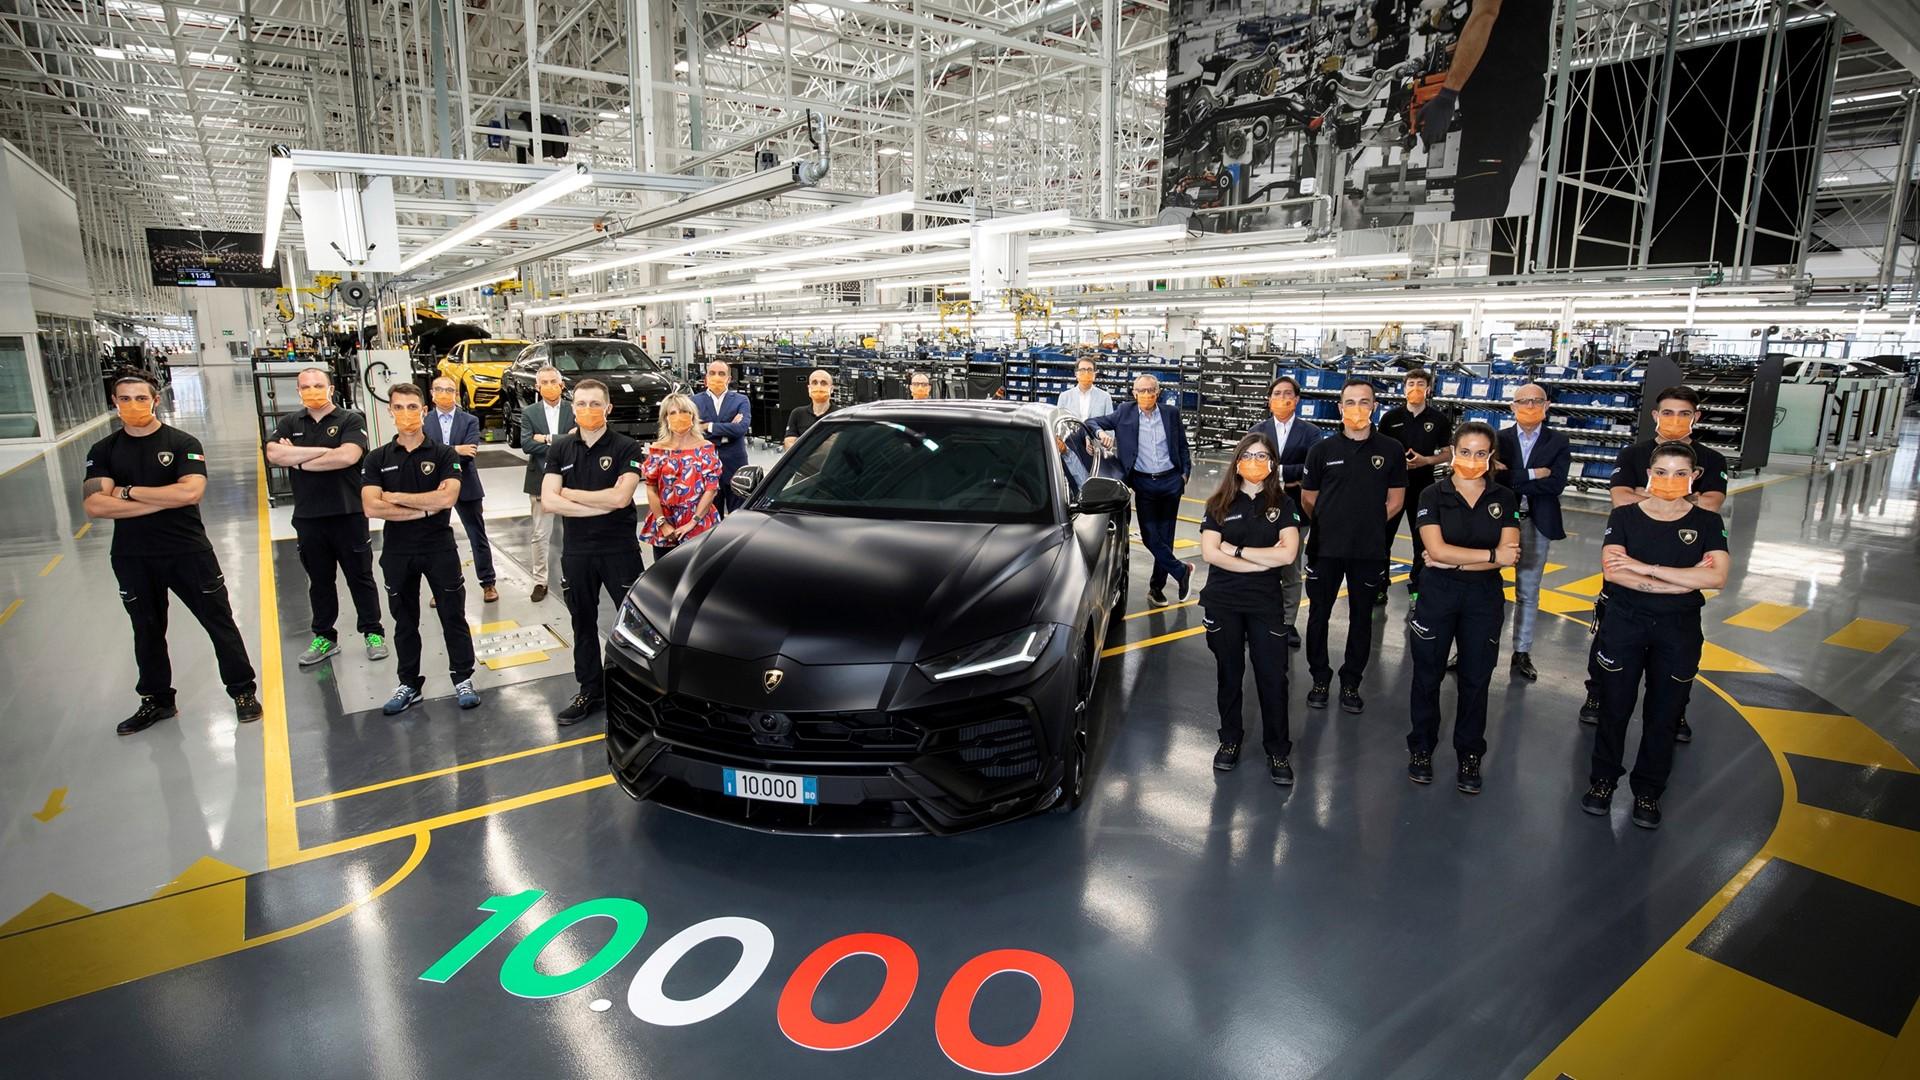 New production record: Automobili Lamborghini celebrates the 10,000th Urus - Image 3